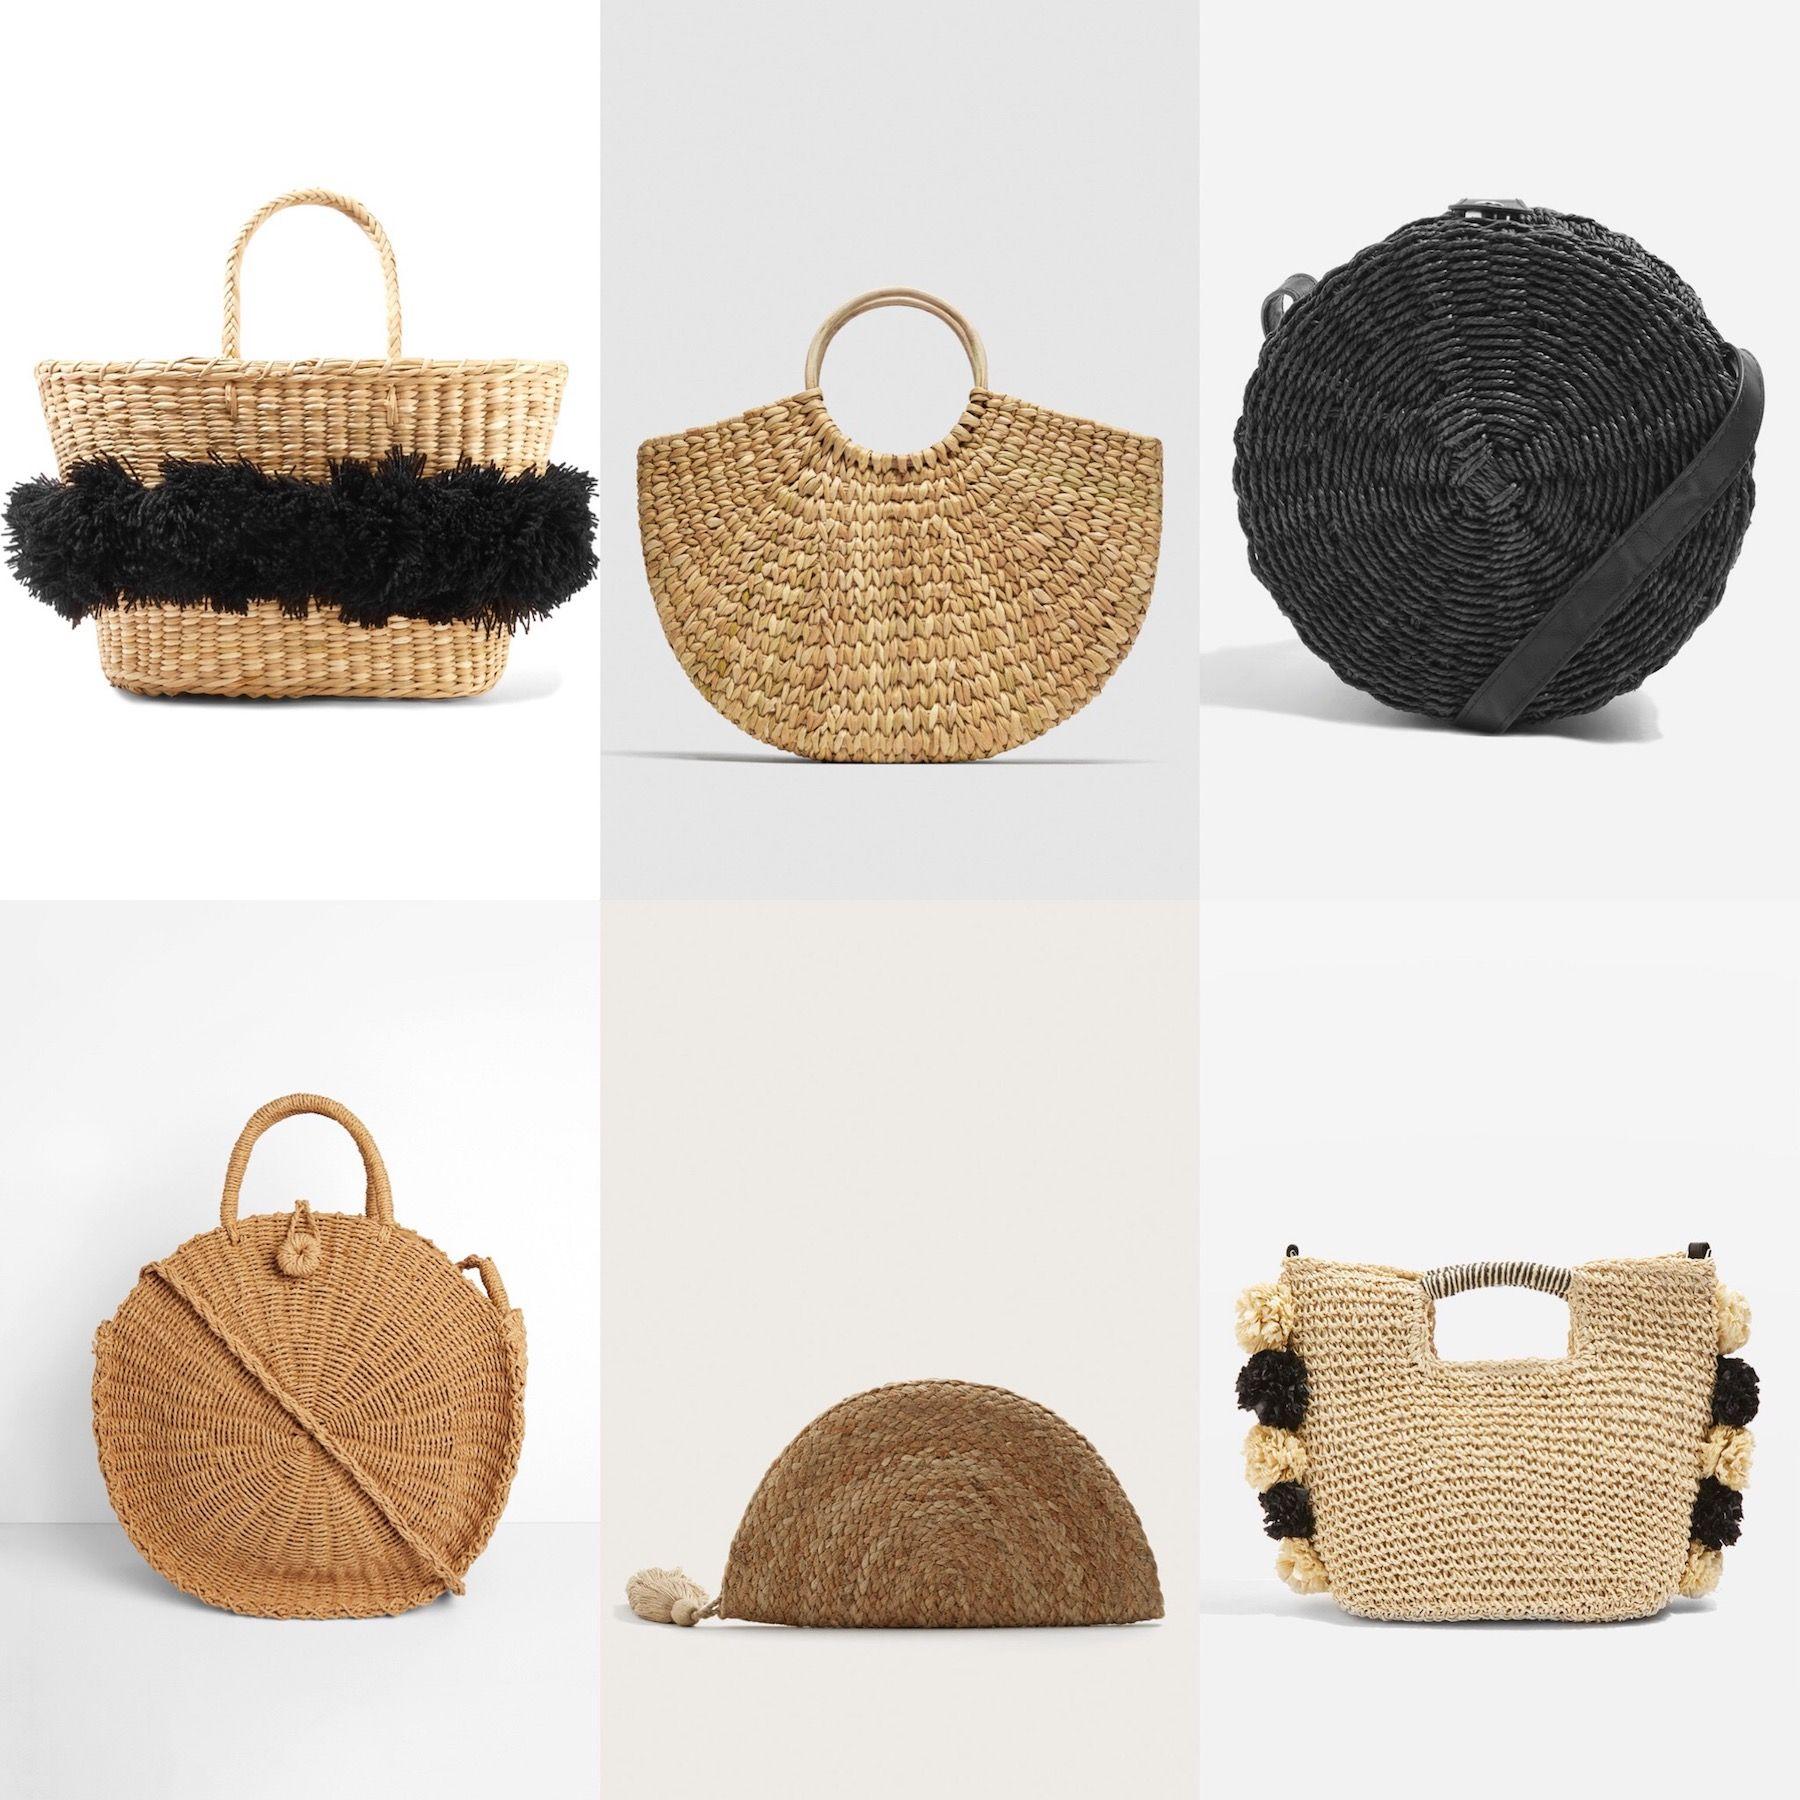 Straw Bag Trend 2018 Basket Bags